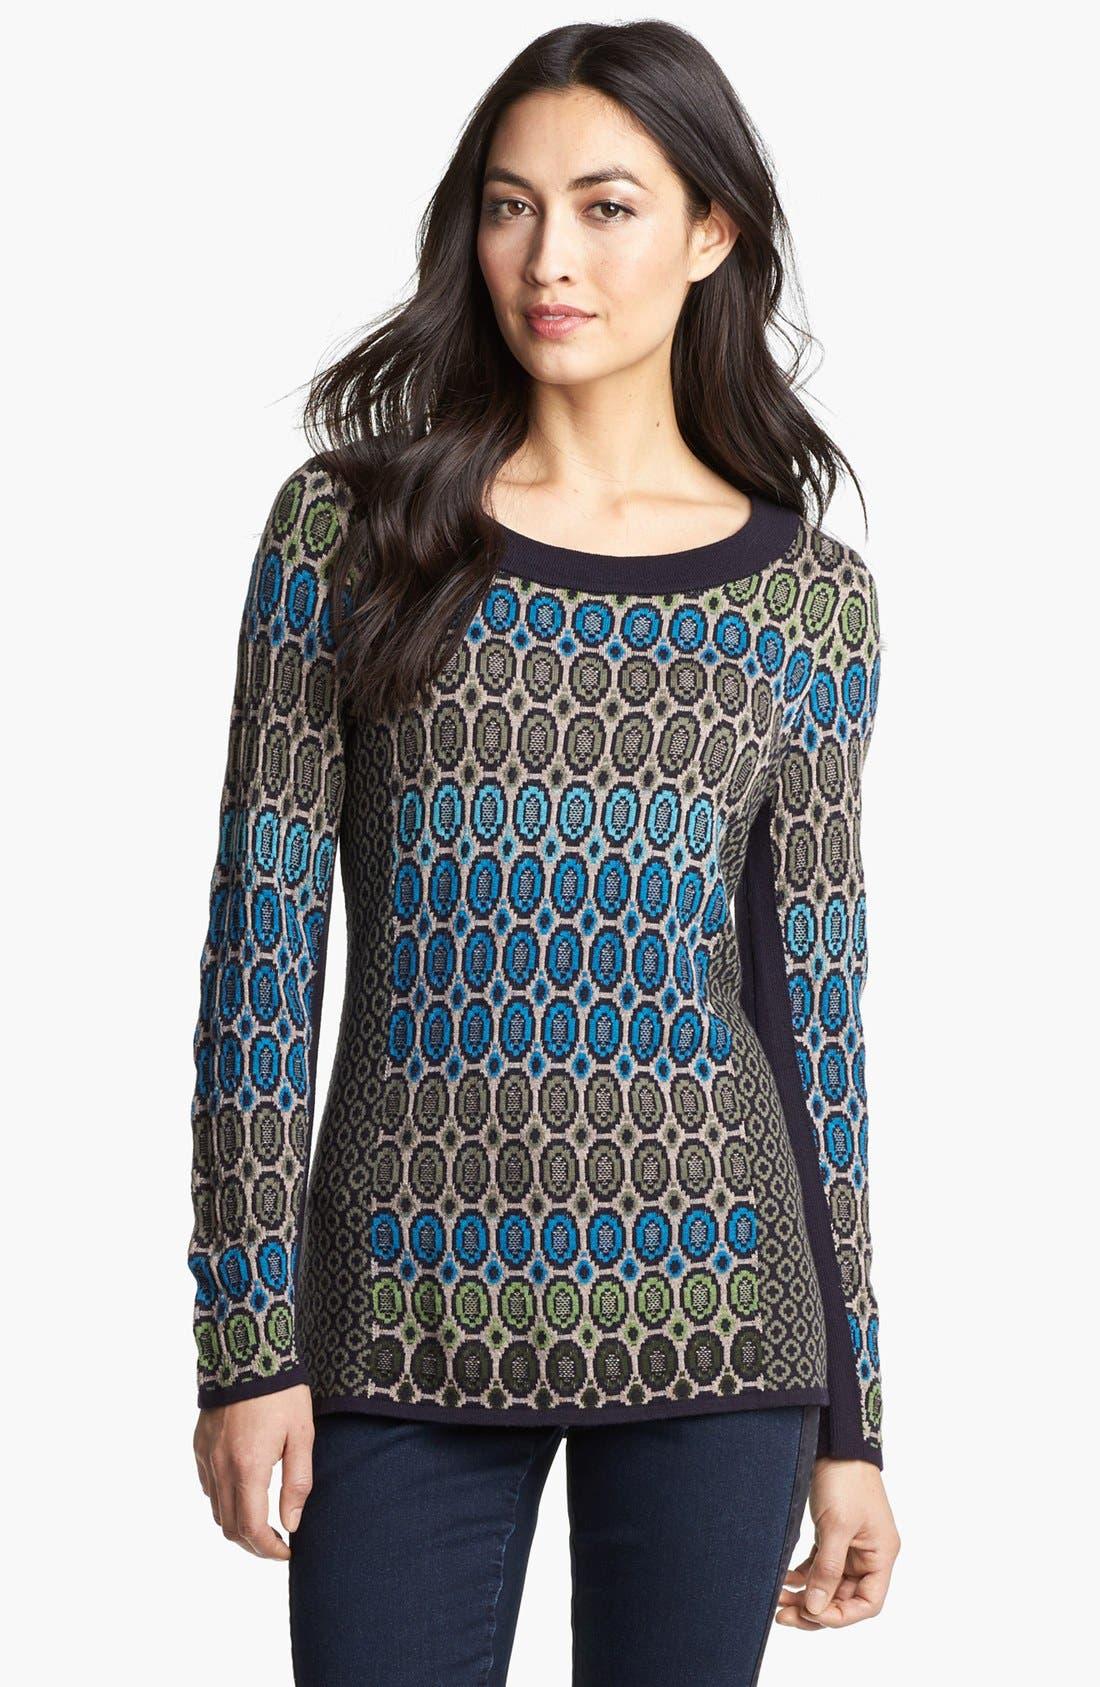 Alternate Image 1 Selected - Nic + Zoe 'Geo Jacquard' Sweater